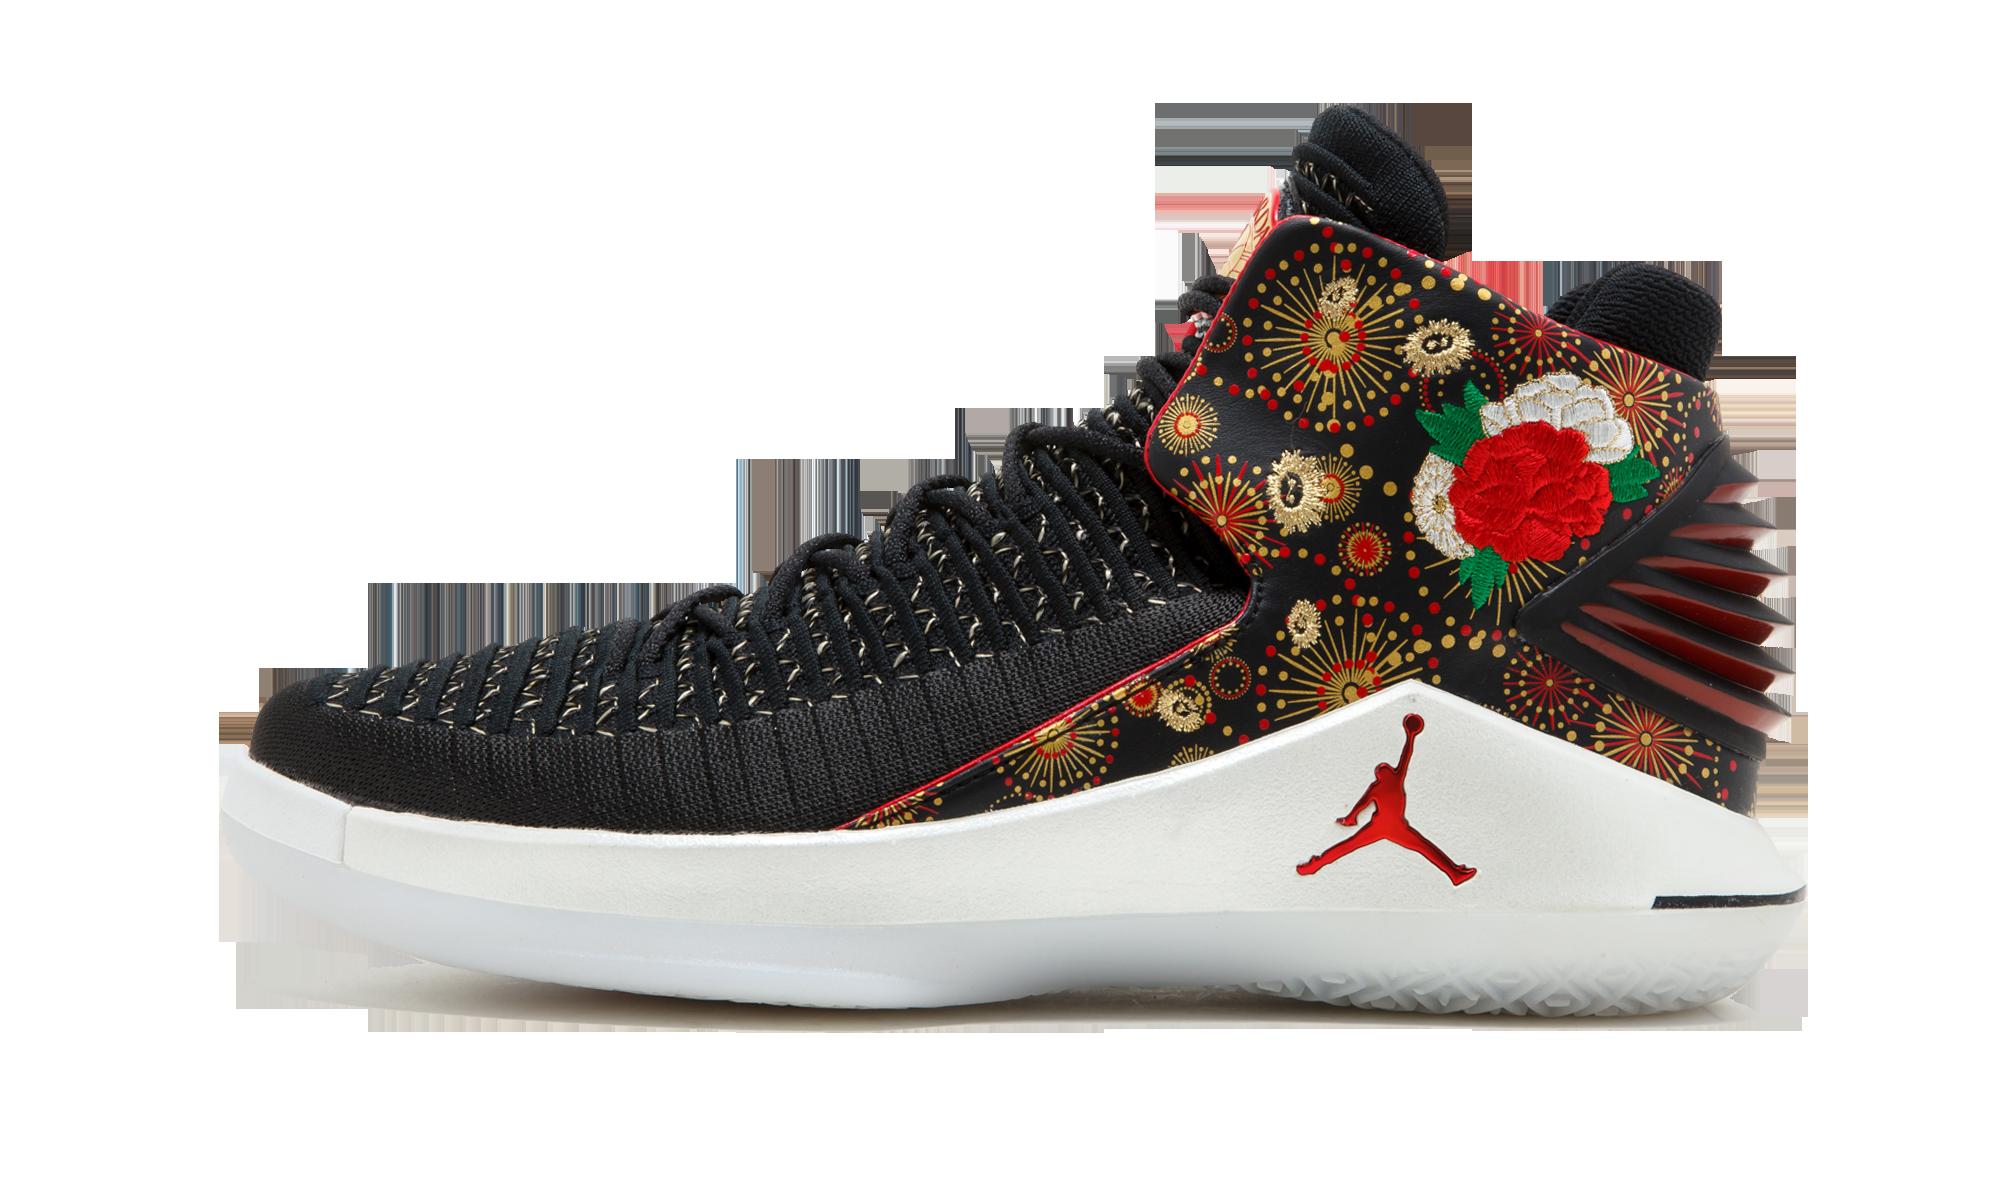 Air Jordan XXXII AJ6331 042 Air Jordan XXXII SKU: AJ6331 042 Color: Black /